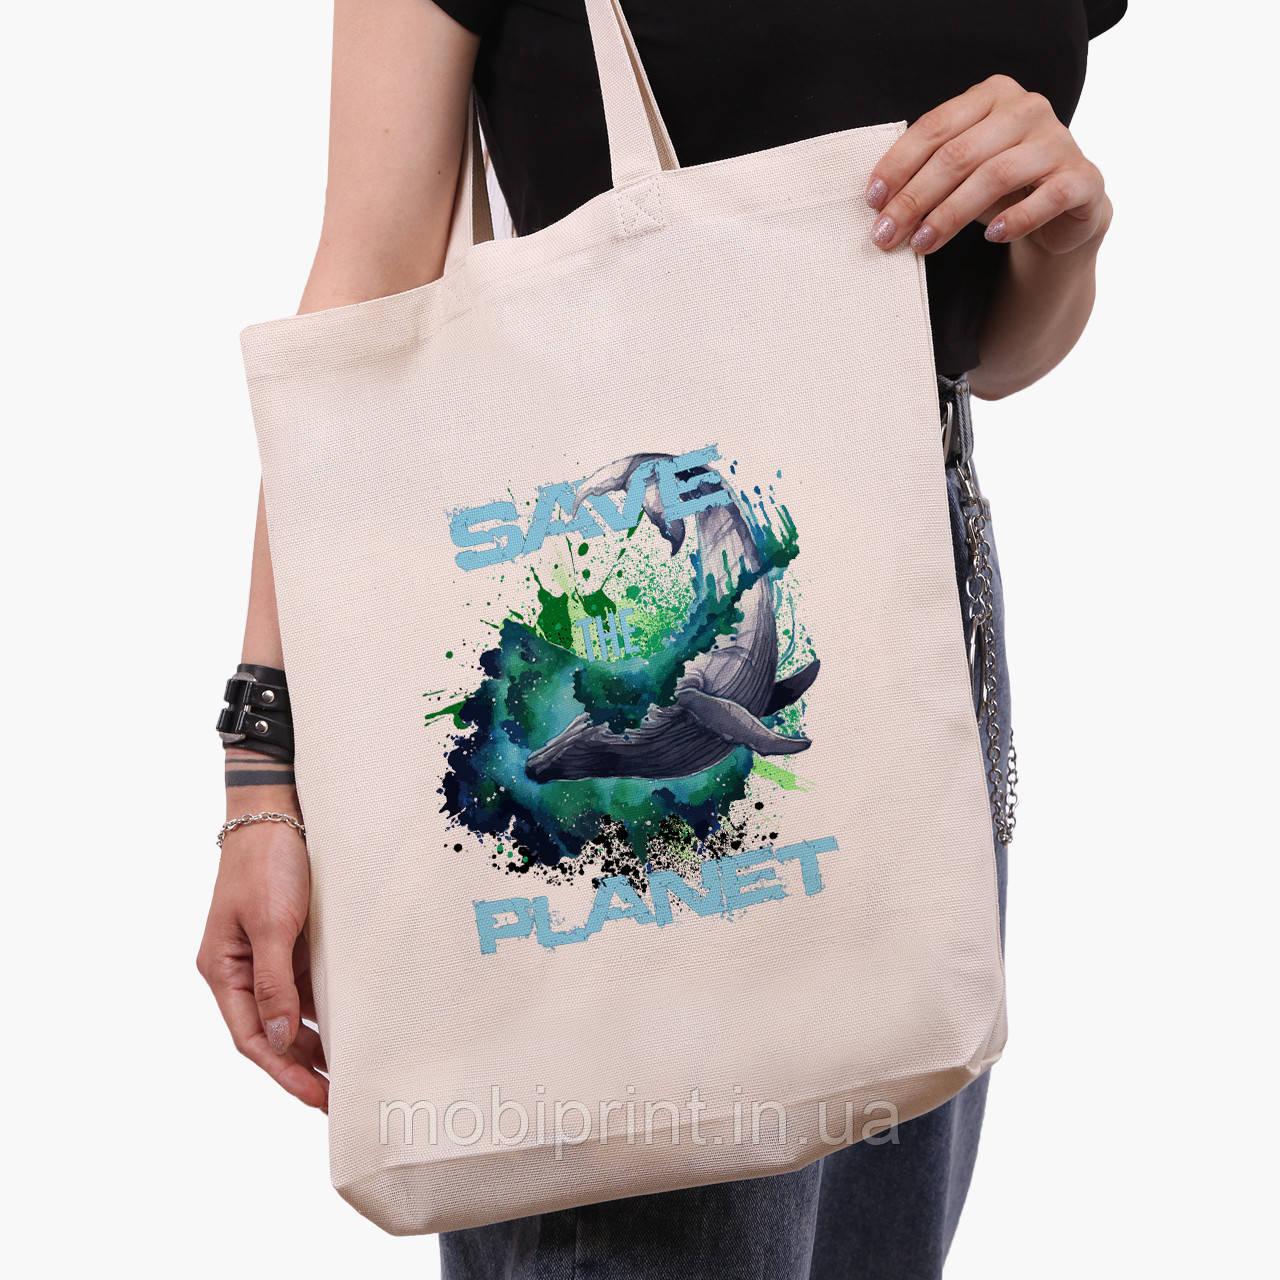 Эко сумка шоппер белая Экология (Ecology) (9227-1337-1)  экосумка шопер 41*39*8 см